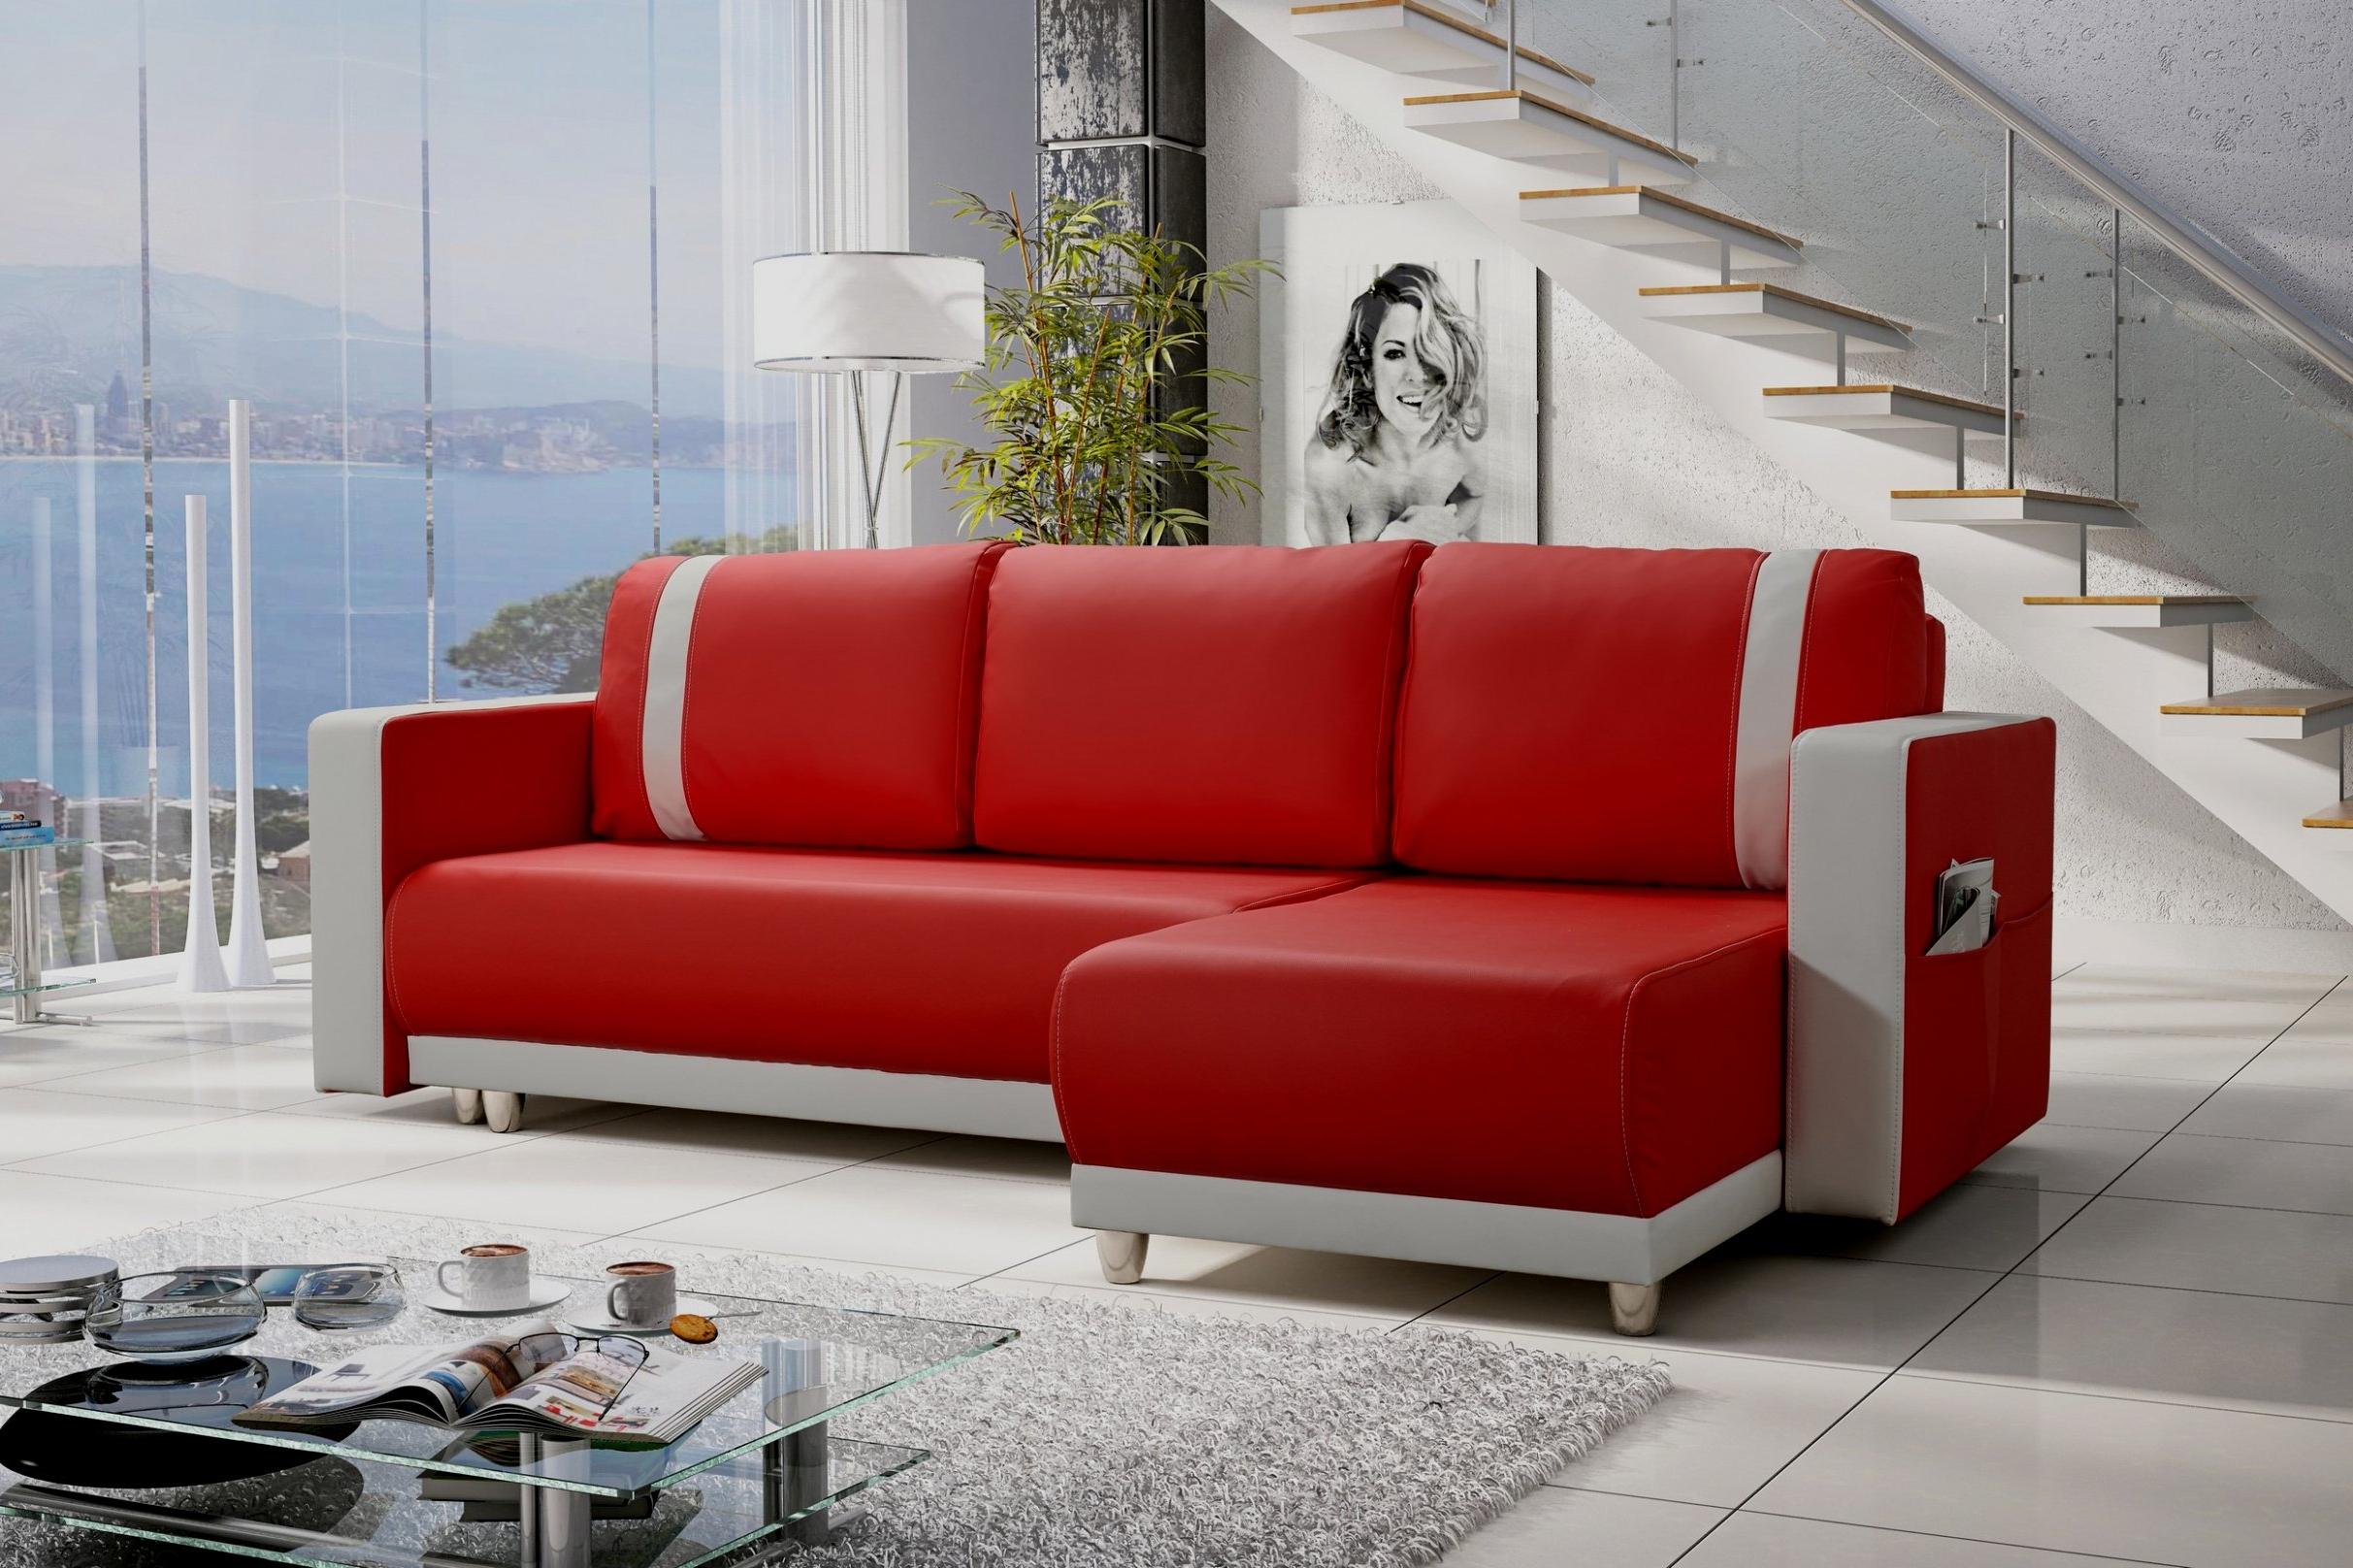 Sofas Valladolid Liquidacion Drdp Liquidacion sofas Chaise Longue Encantador Hermosa sofa Cama